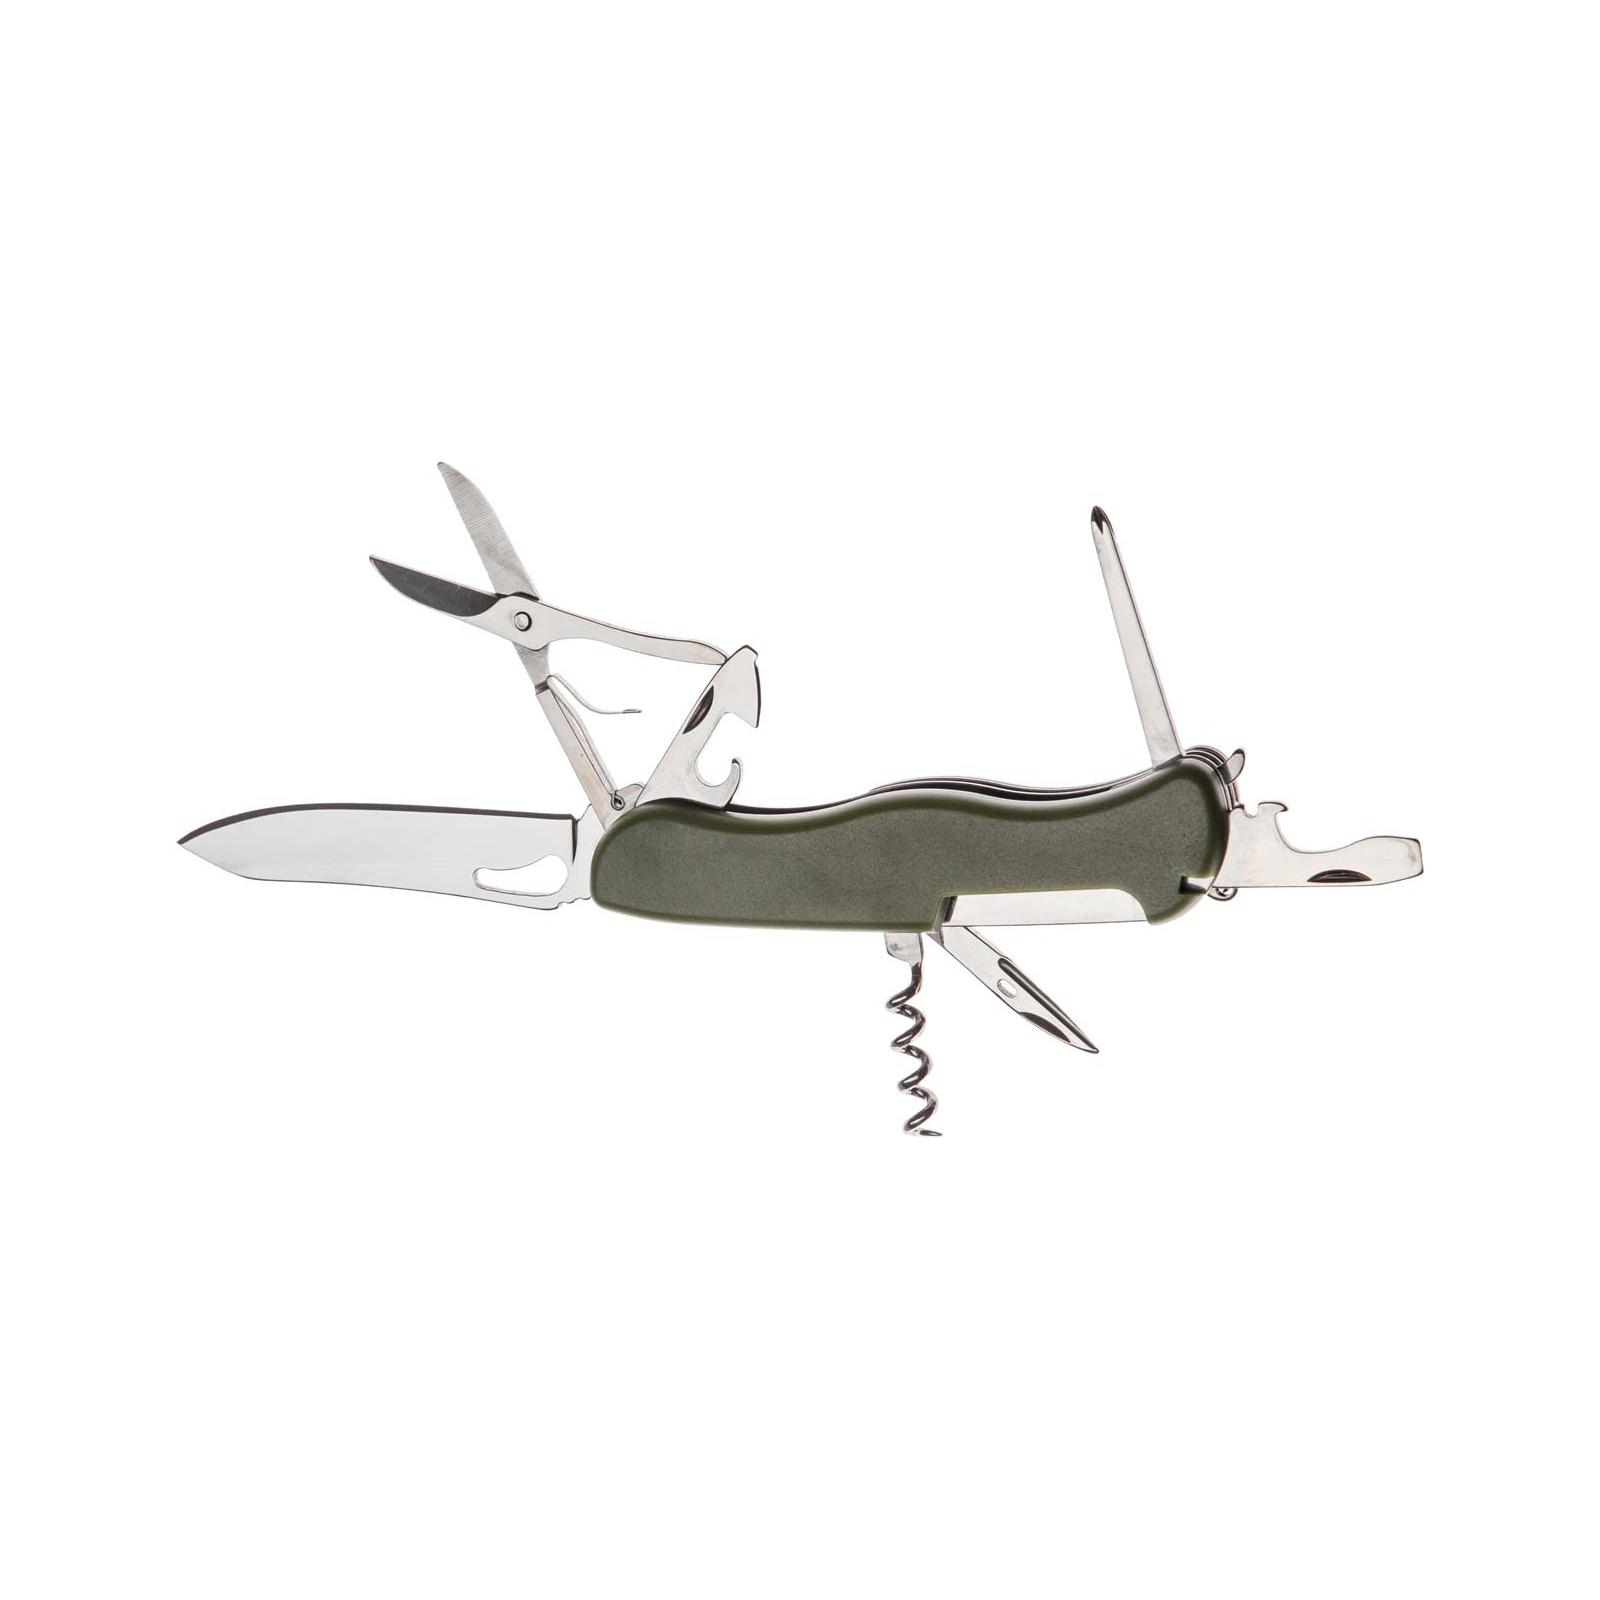 Нож Partner HH032014110 OL olive (HH032014110 OL)